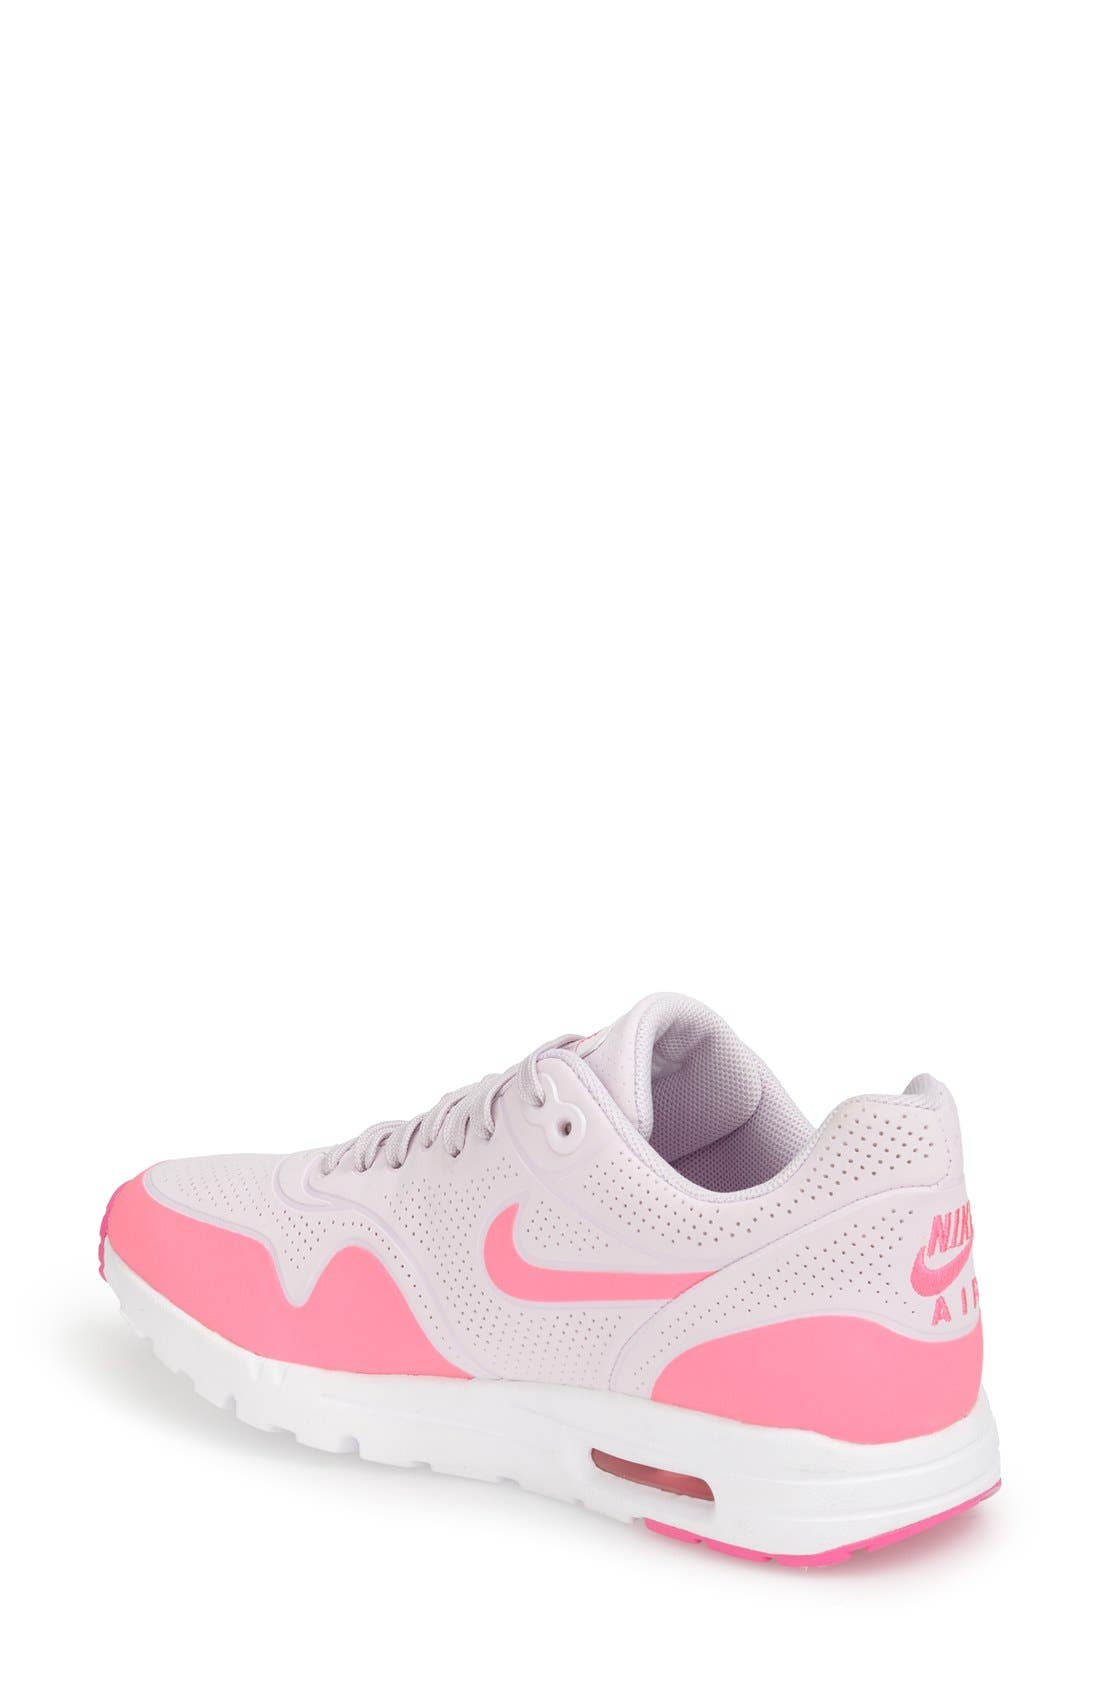 ,                             'Air Max 1 - Ultra Moire' Sneaker,                             Alternate thumbnail 98, color,                             501